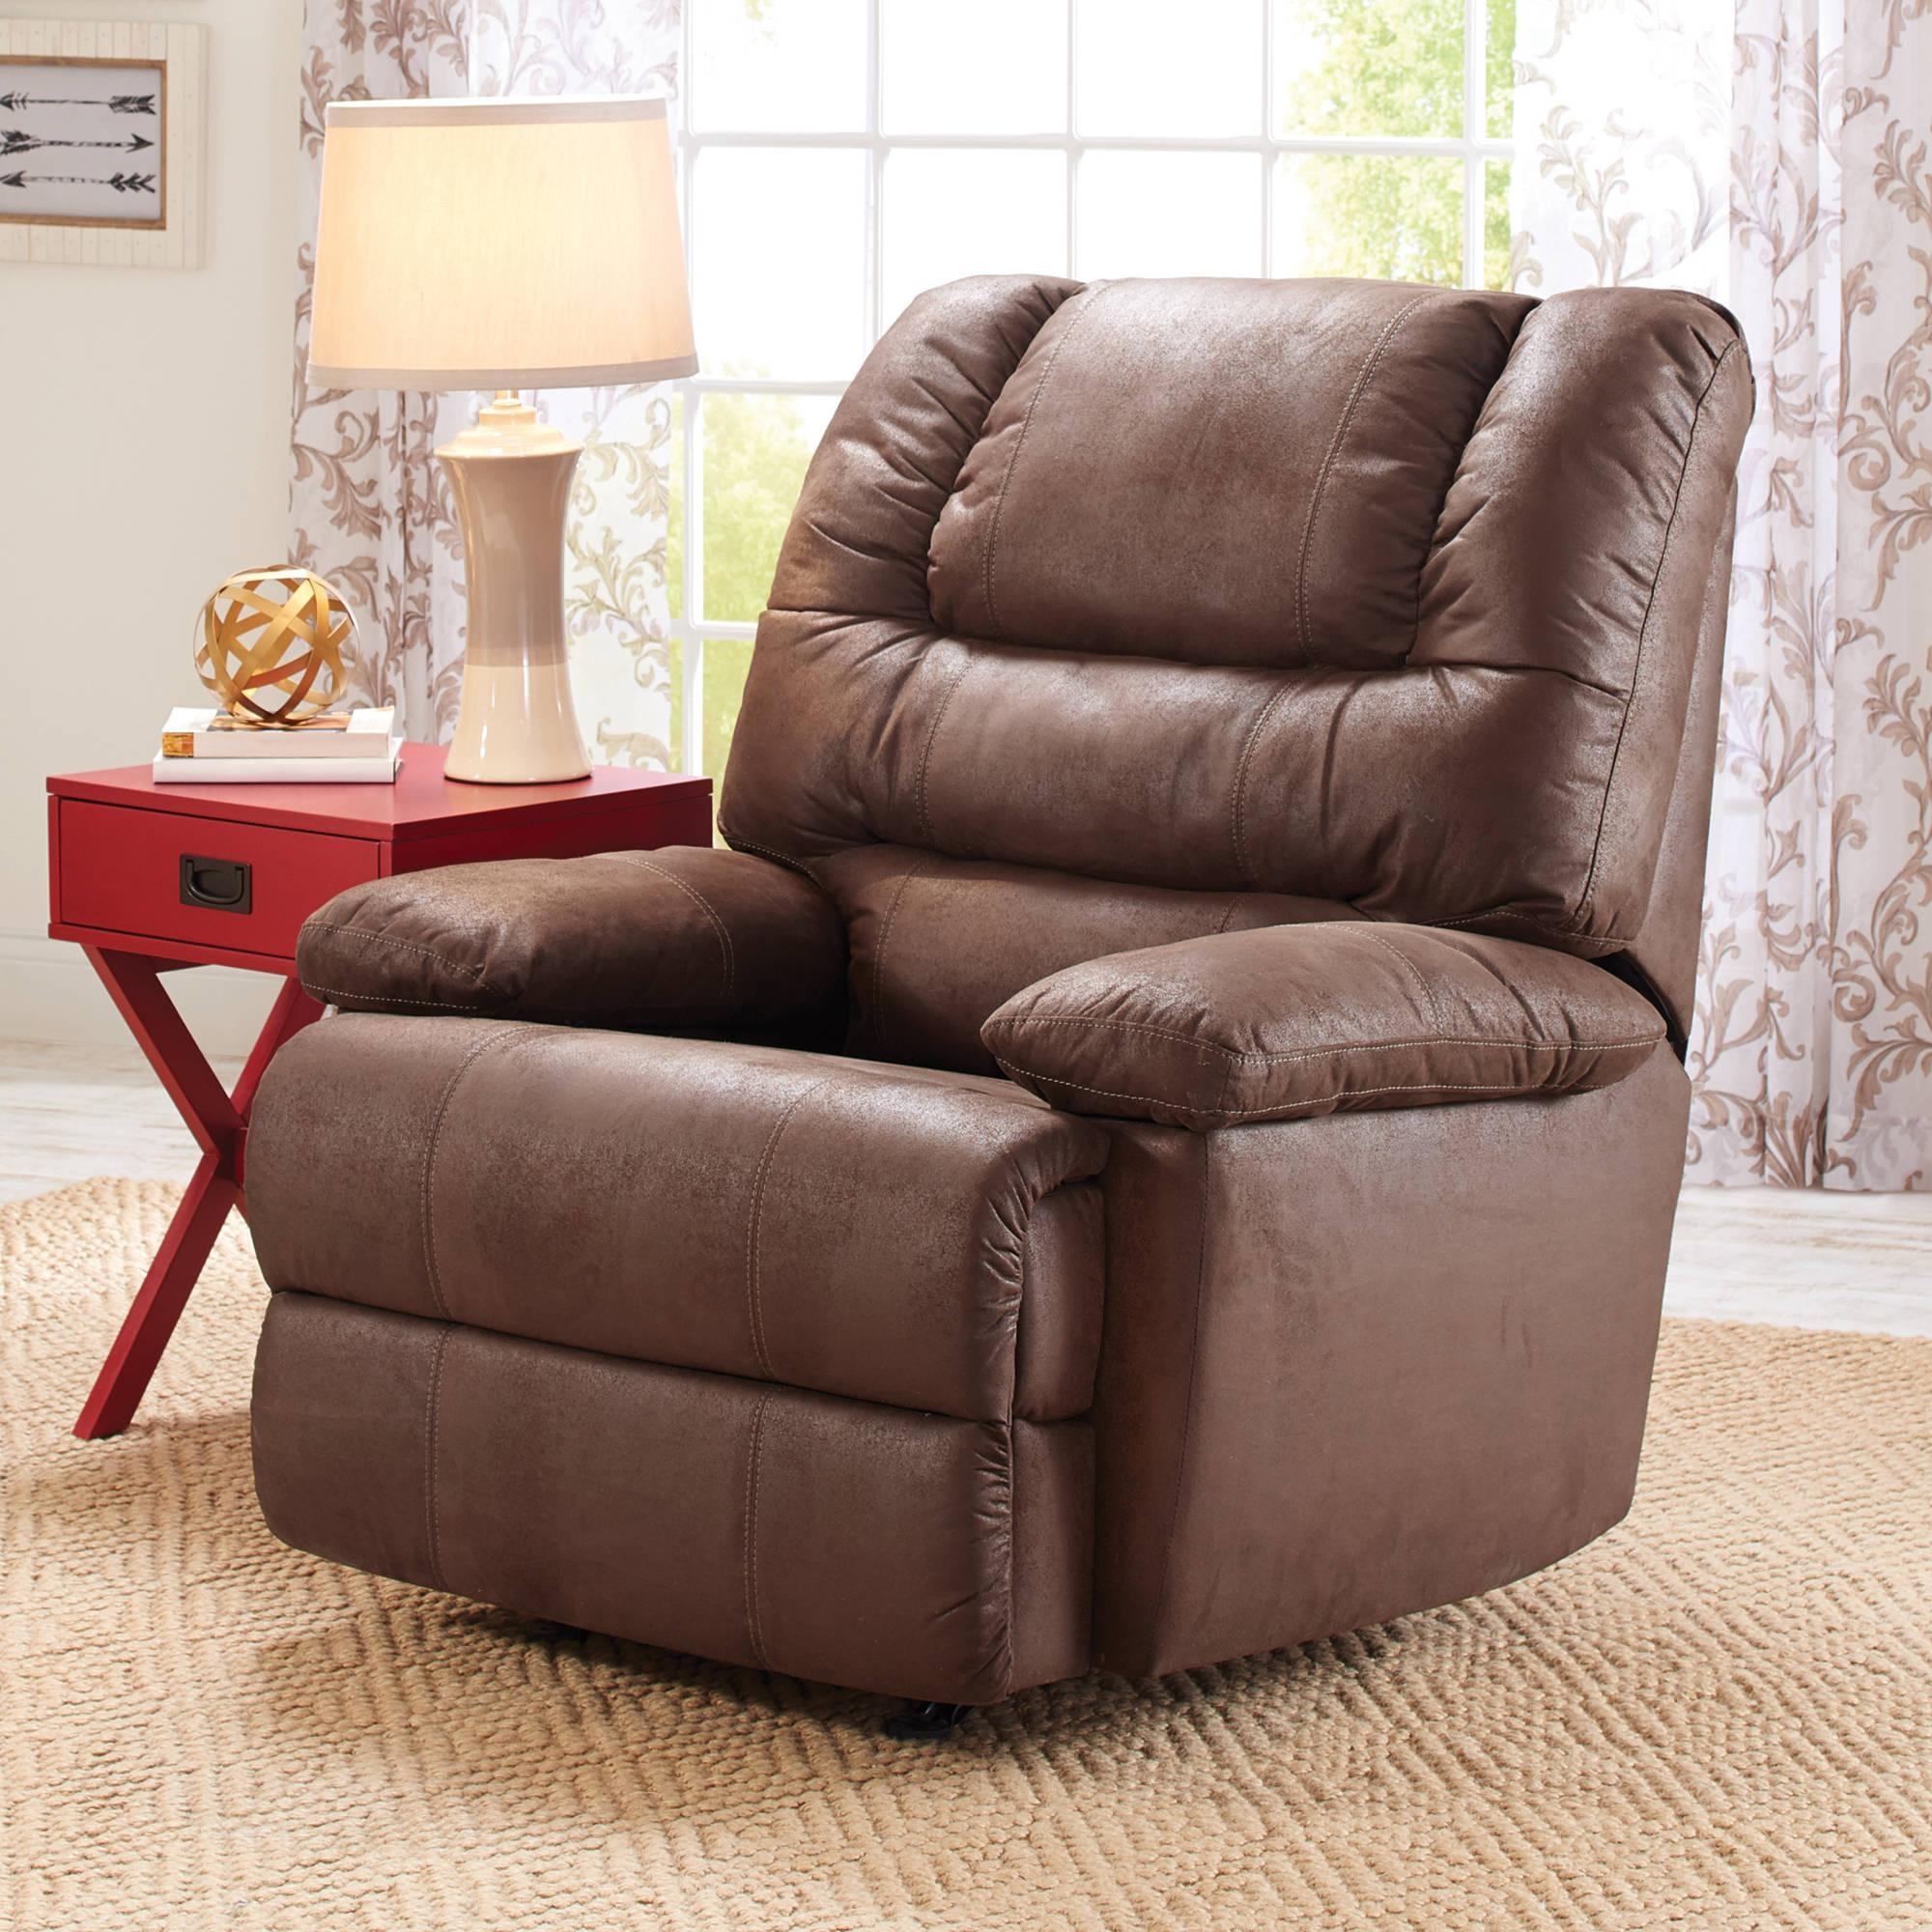 Walmart Furniture Living Room: 20 Photos Big Sofa Chairs